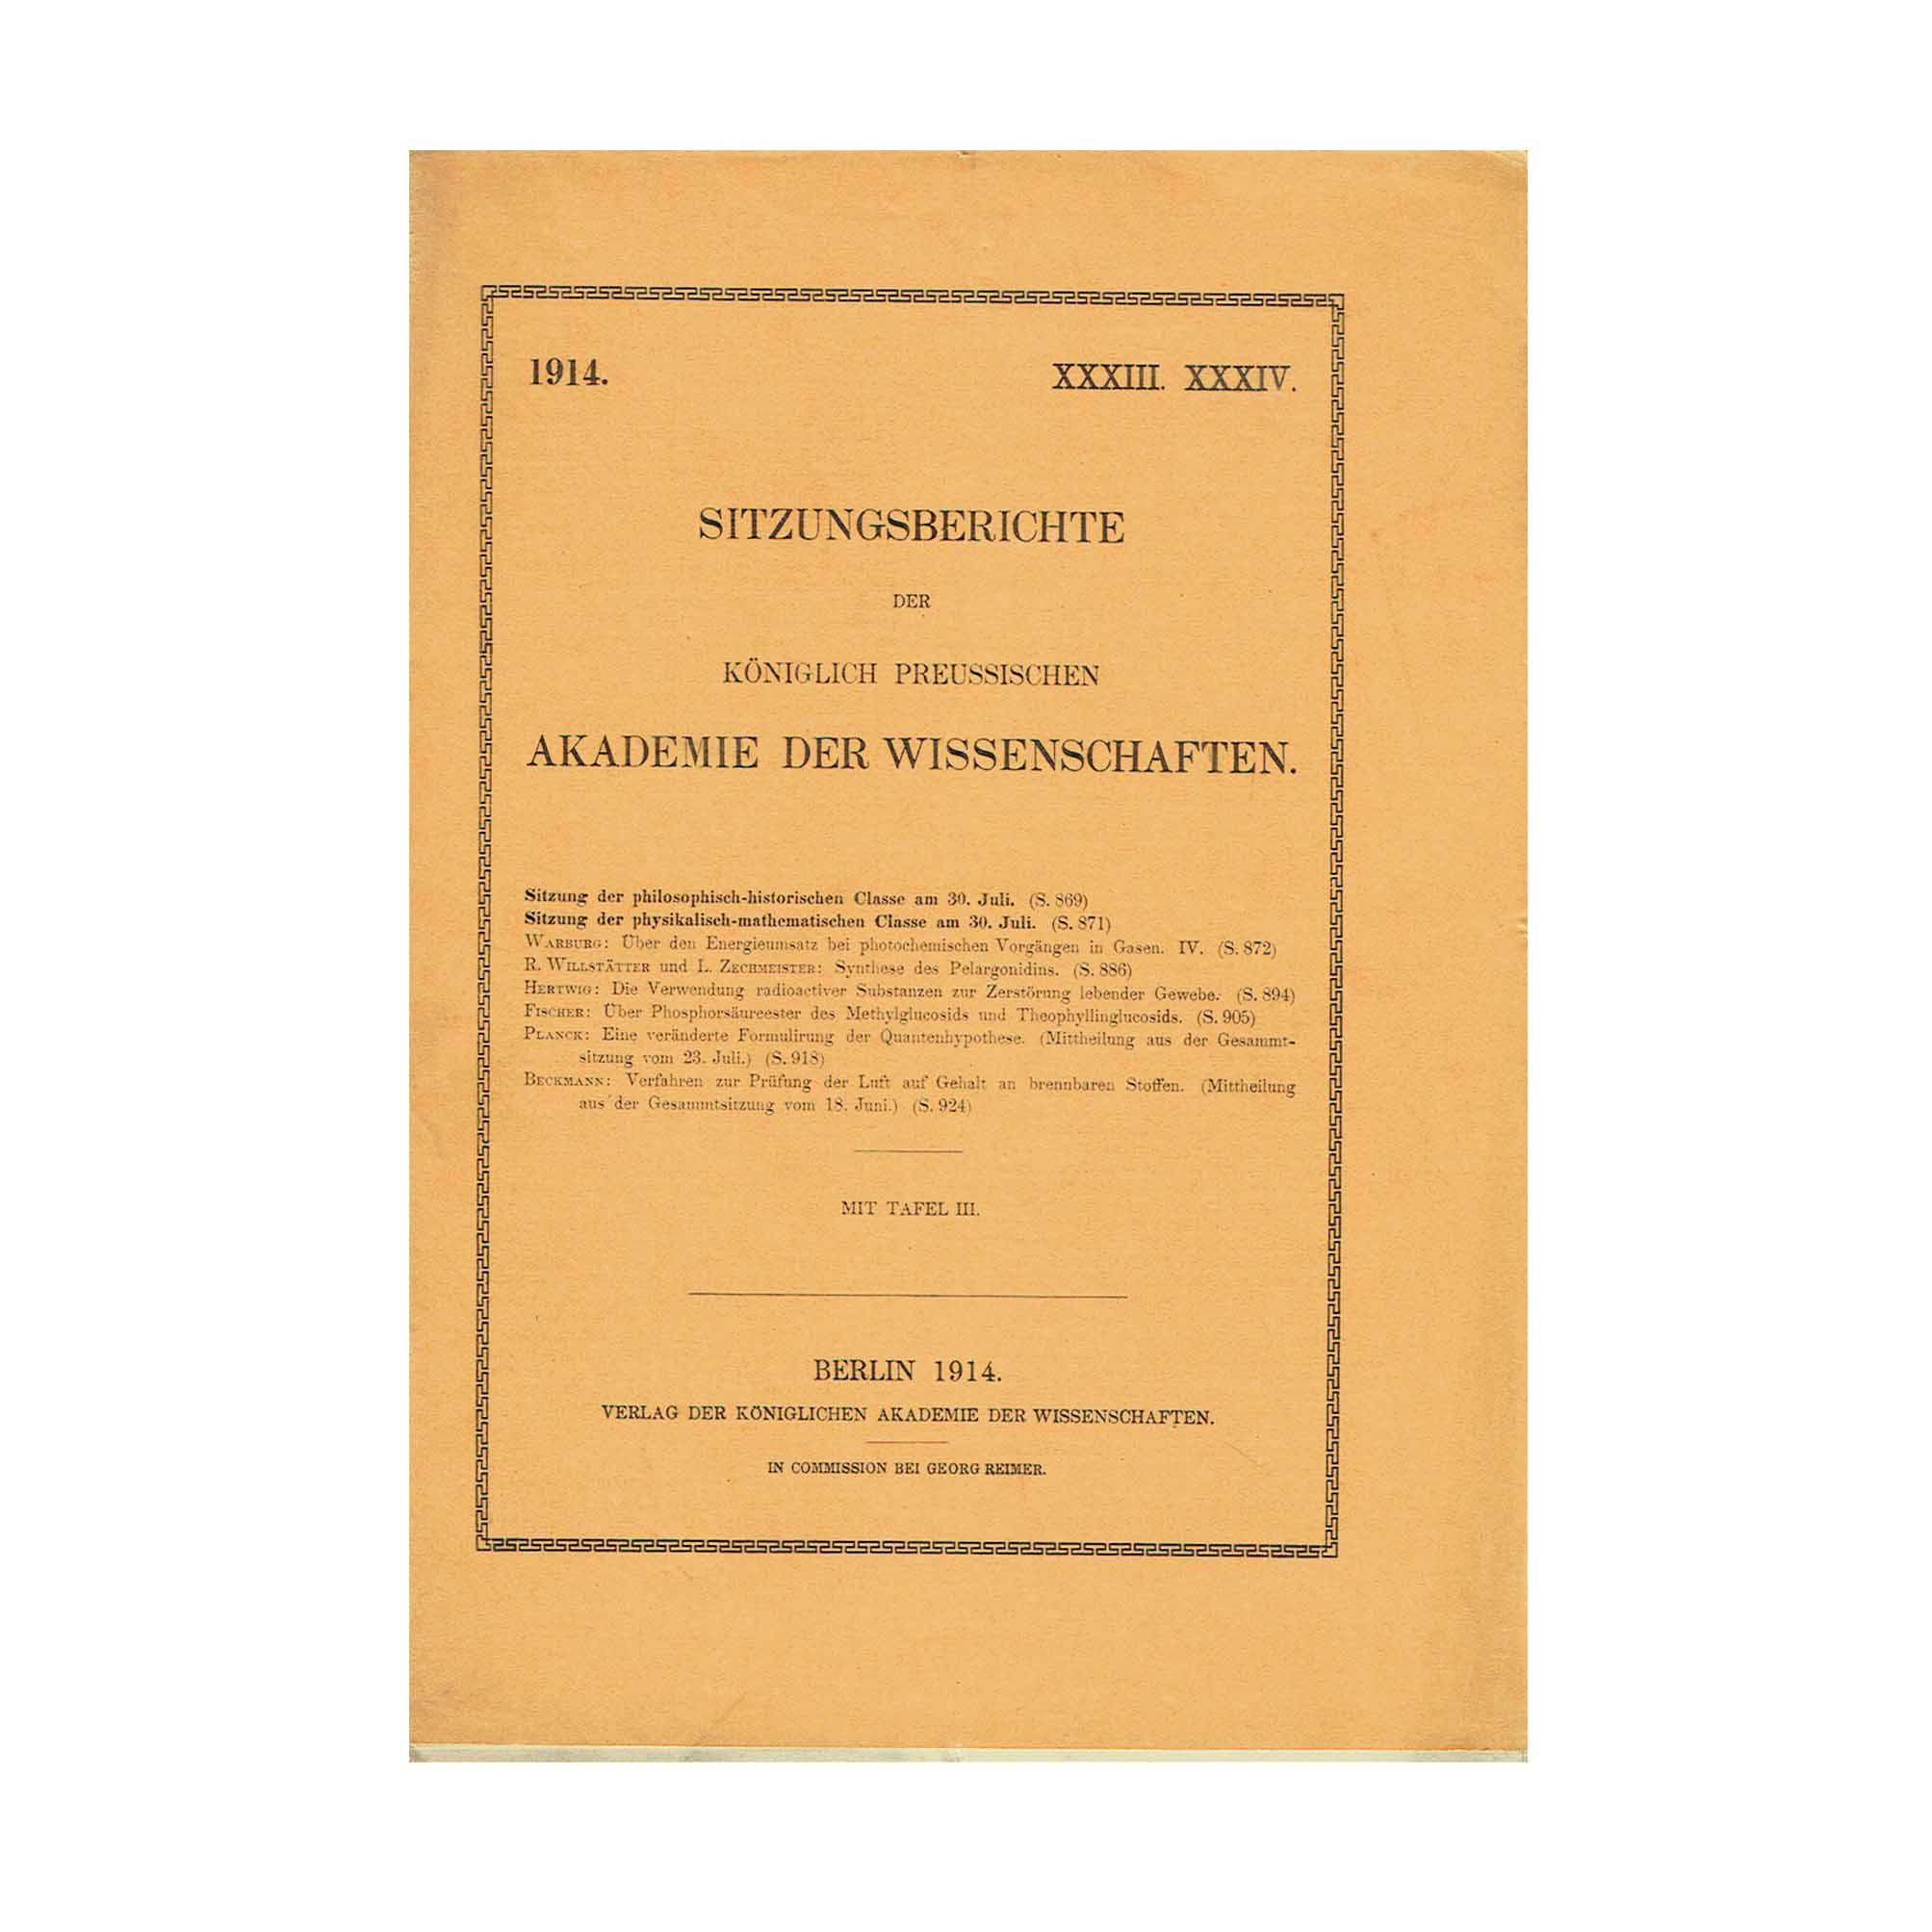 5818K Planck Veränderte Quantenhypothese First Separate 1914 Front Cover N